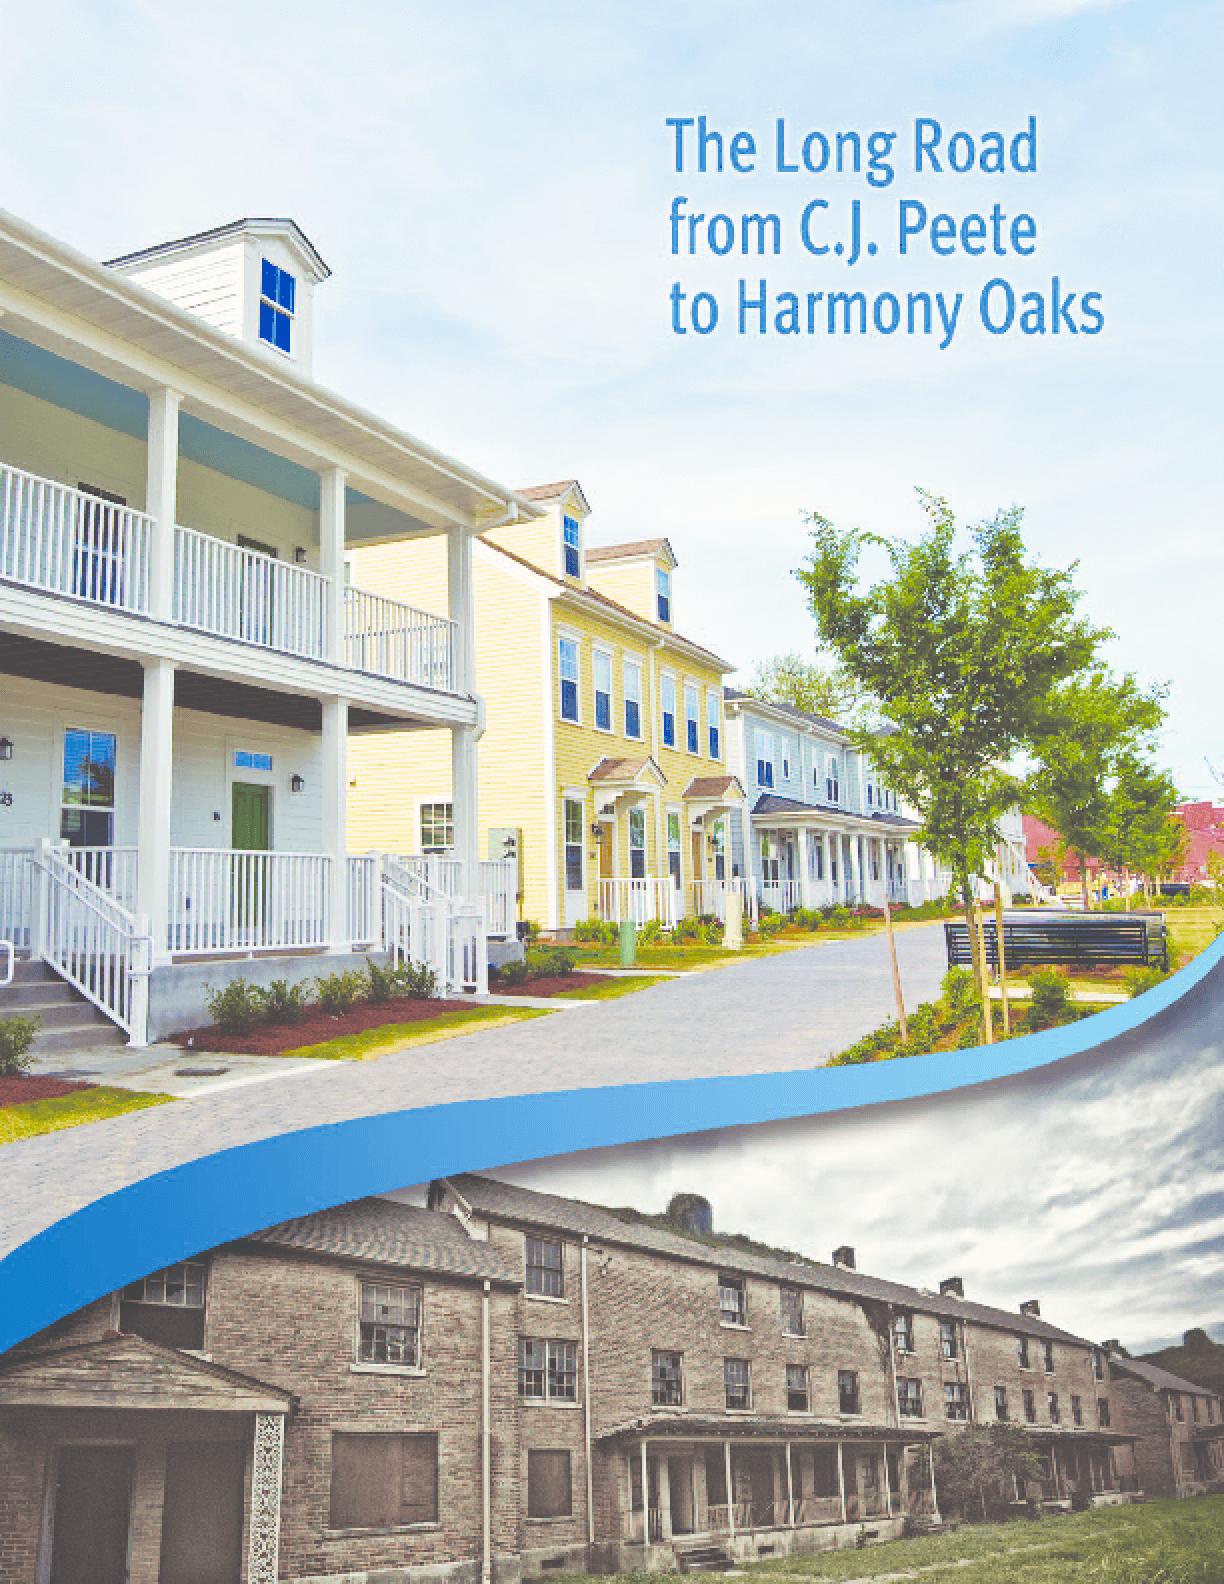 The Long Road from C.J. Peete to Harmony Oaks